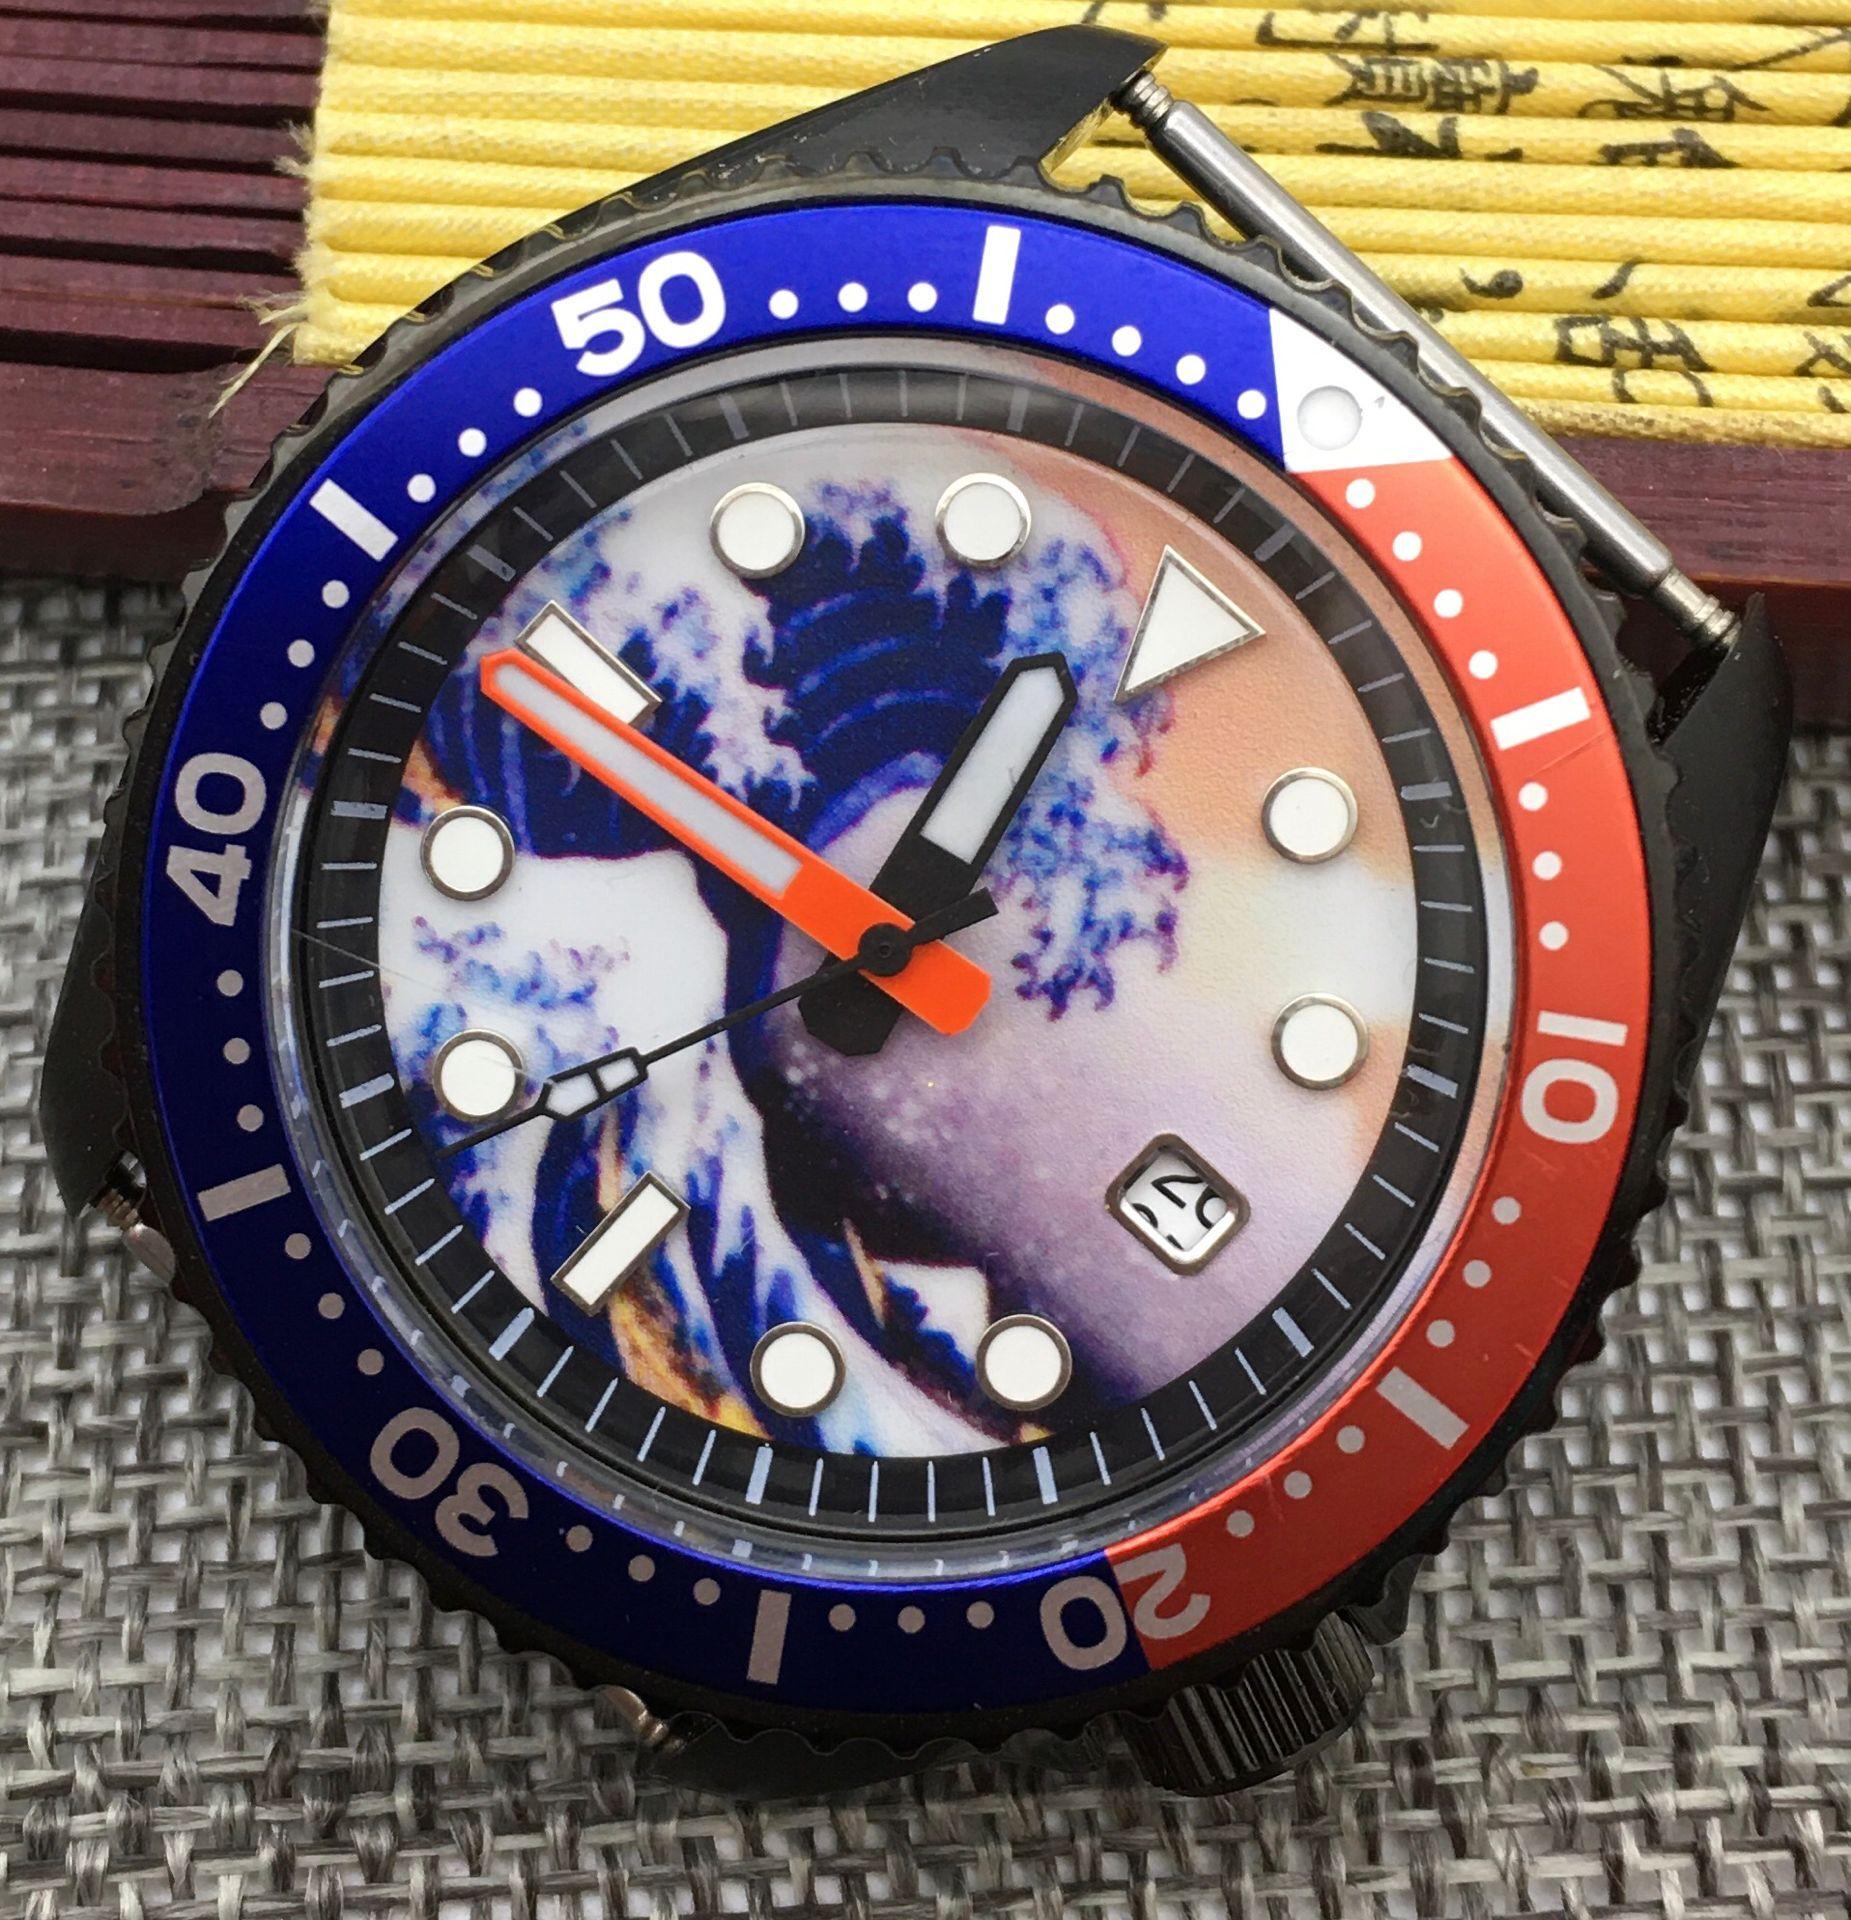 42mm Kanagawa Surf Dial Luminous SK007 Japanese Movement NH35 Watch Mechanical Automatic Men's Watch Coke bezel